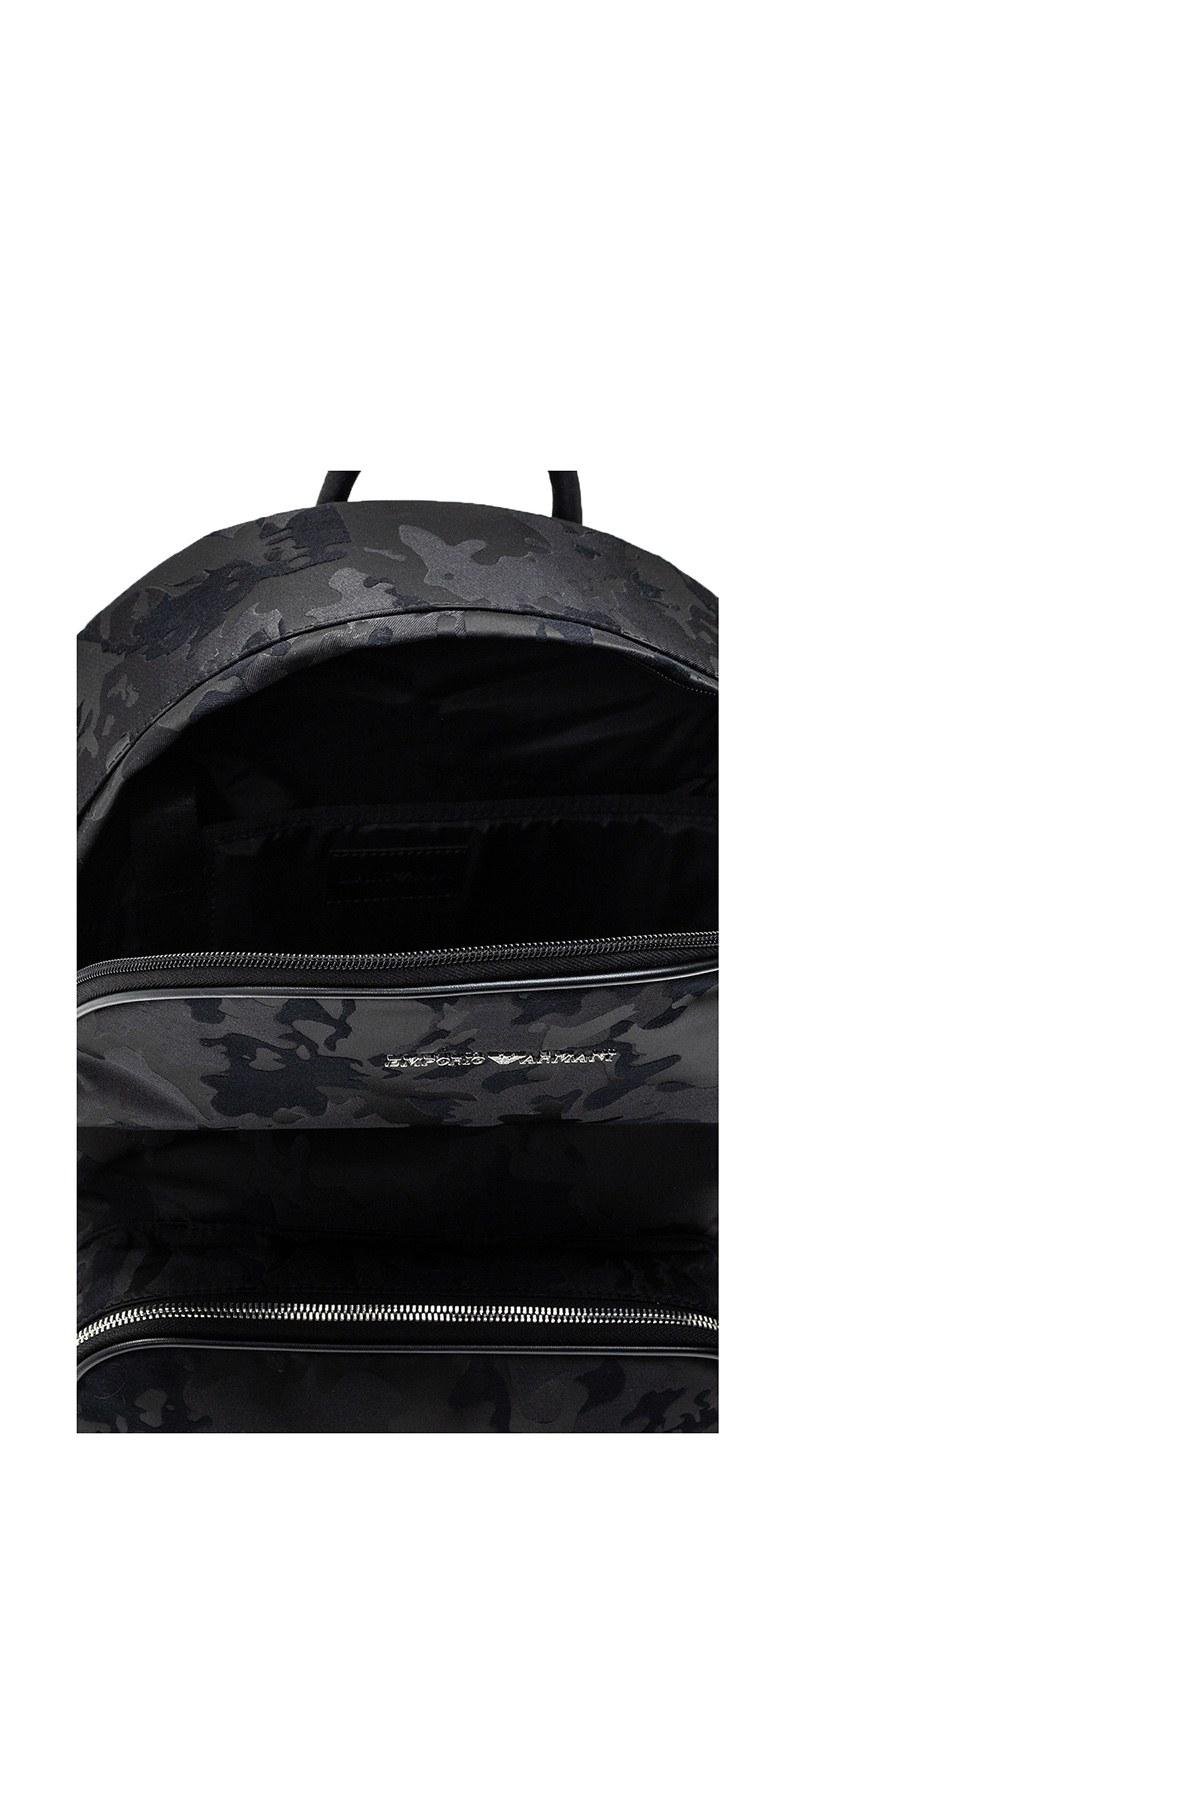 Emporio Armani Ayarlanabilir Askılı Erkek Çanta Y4O311 Y018E 85149 SİYAH